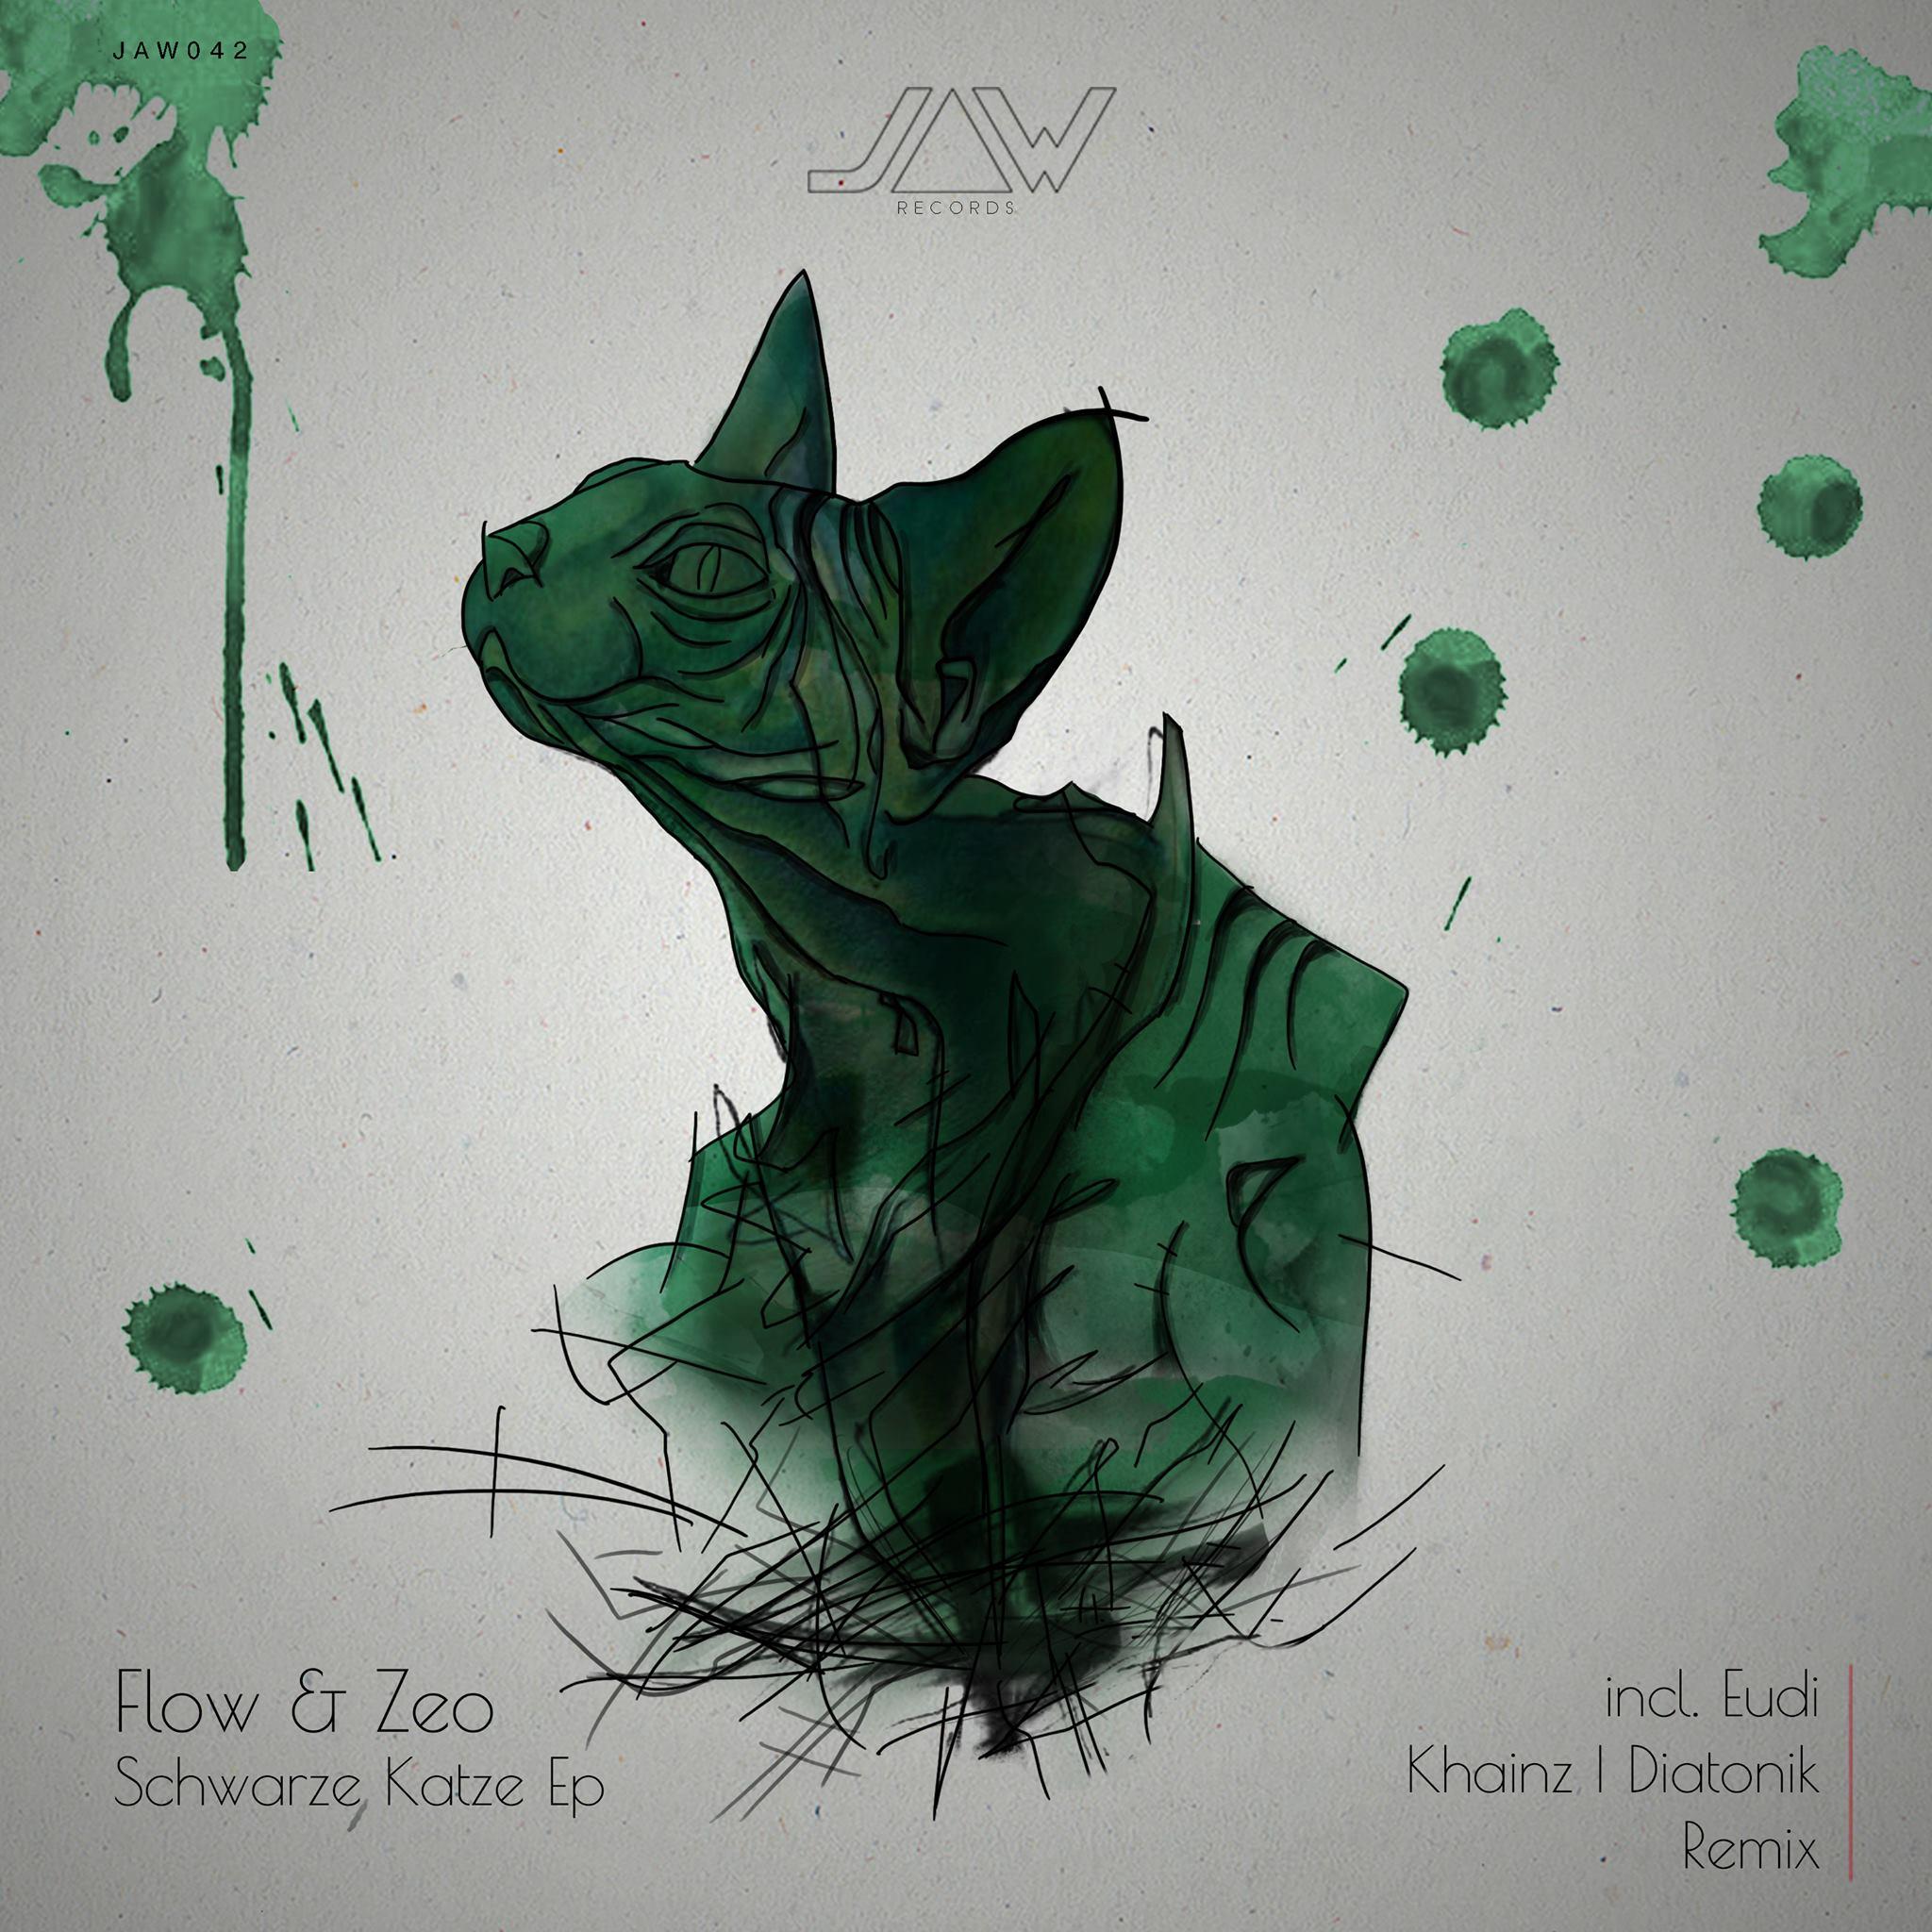 Flow&Zeo | EUDI Premiere by CHOUETTE MUSIQUE